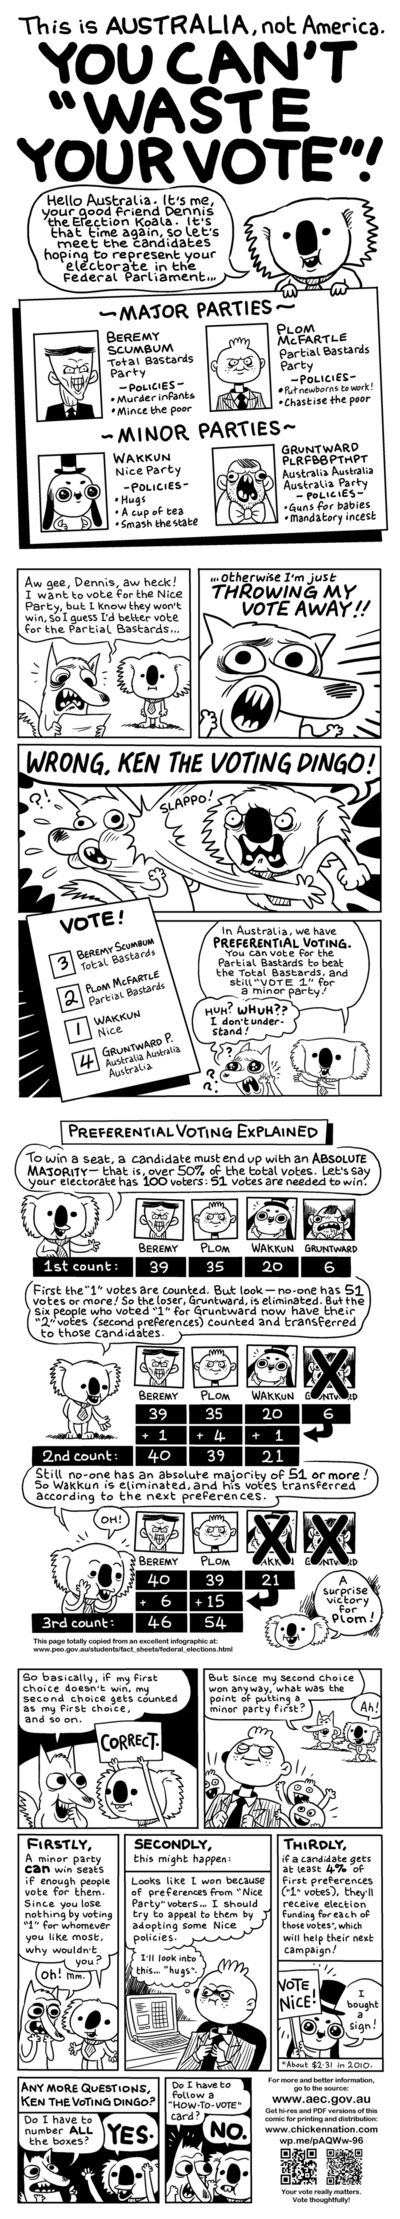 Web-700-cant-waste-vote-SINGLE-IMAGE